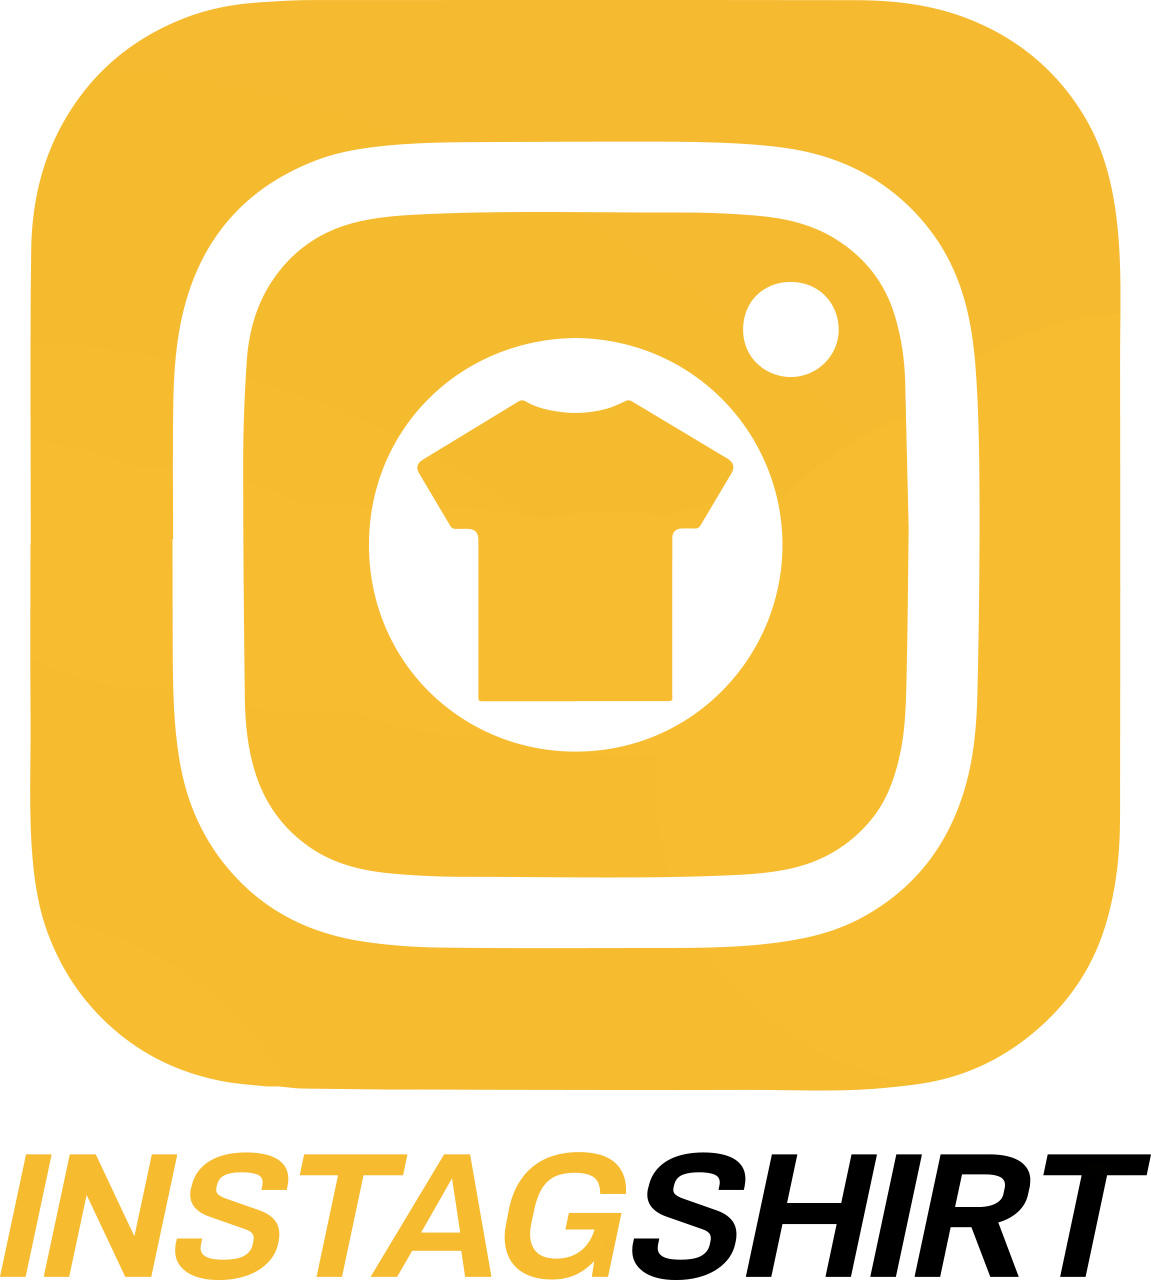 InstagShirt